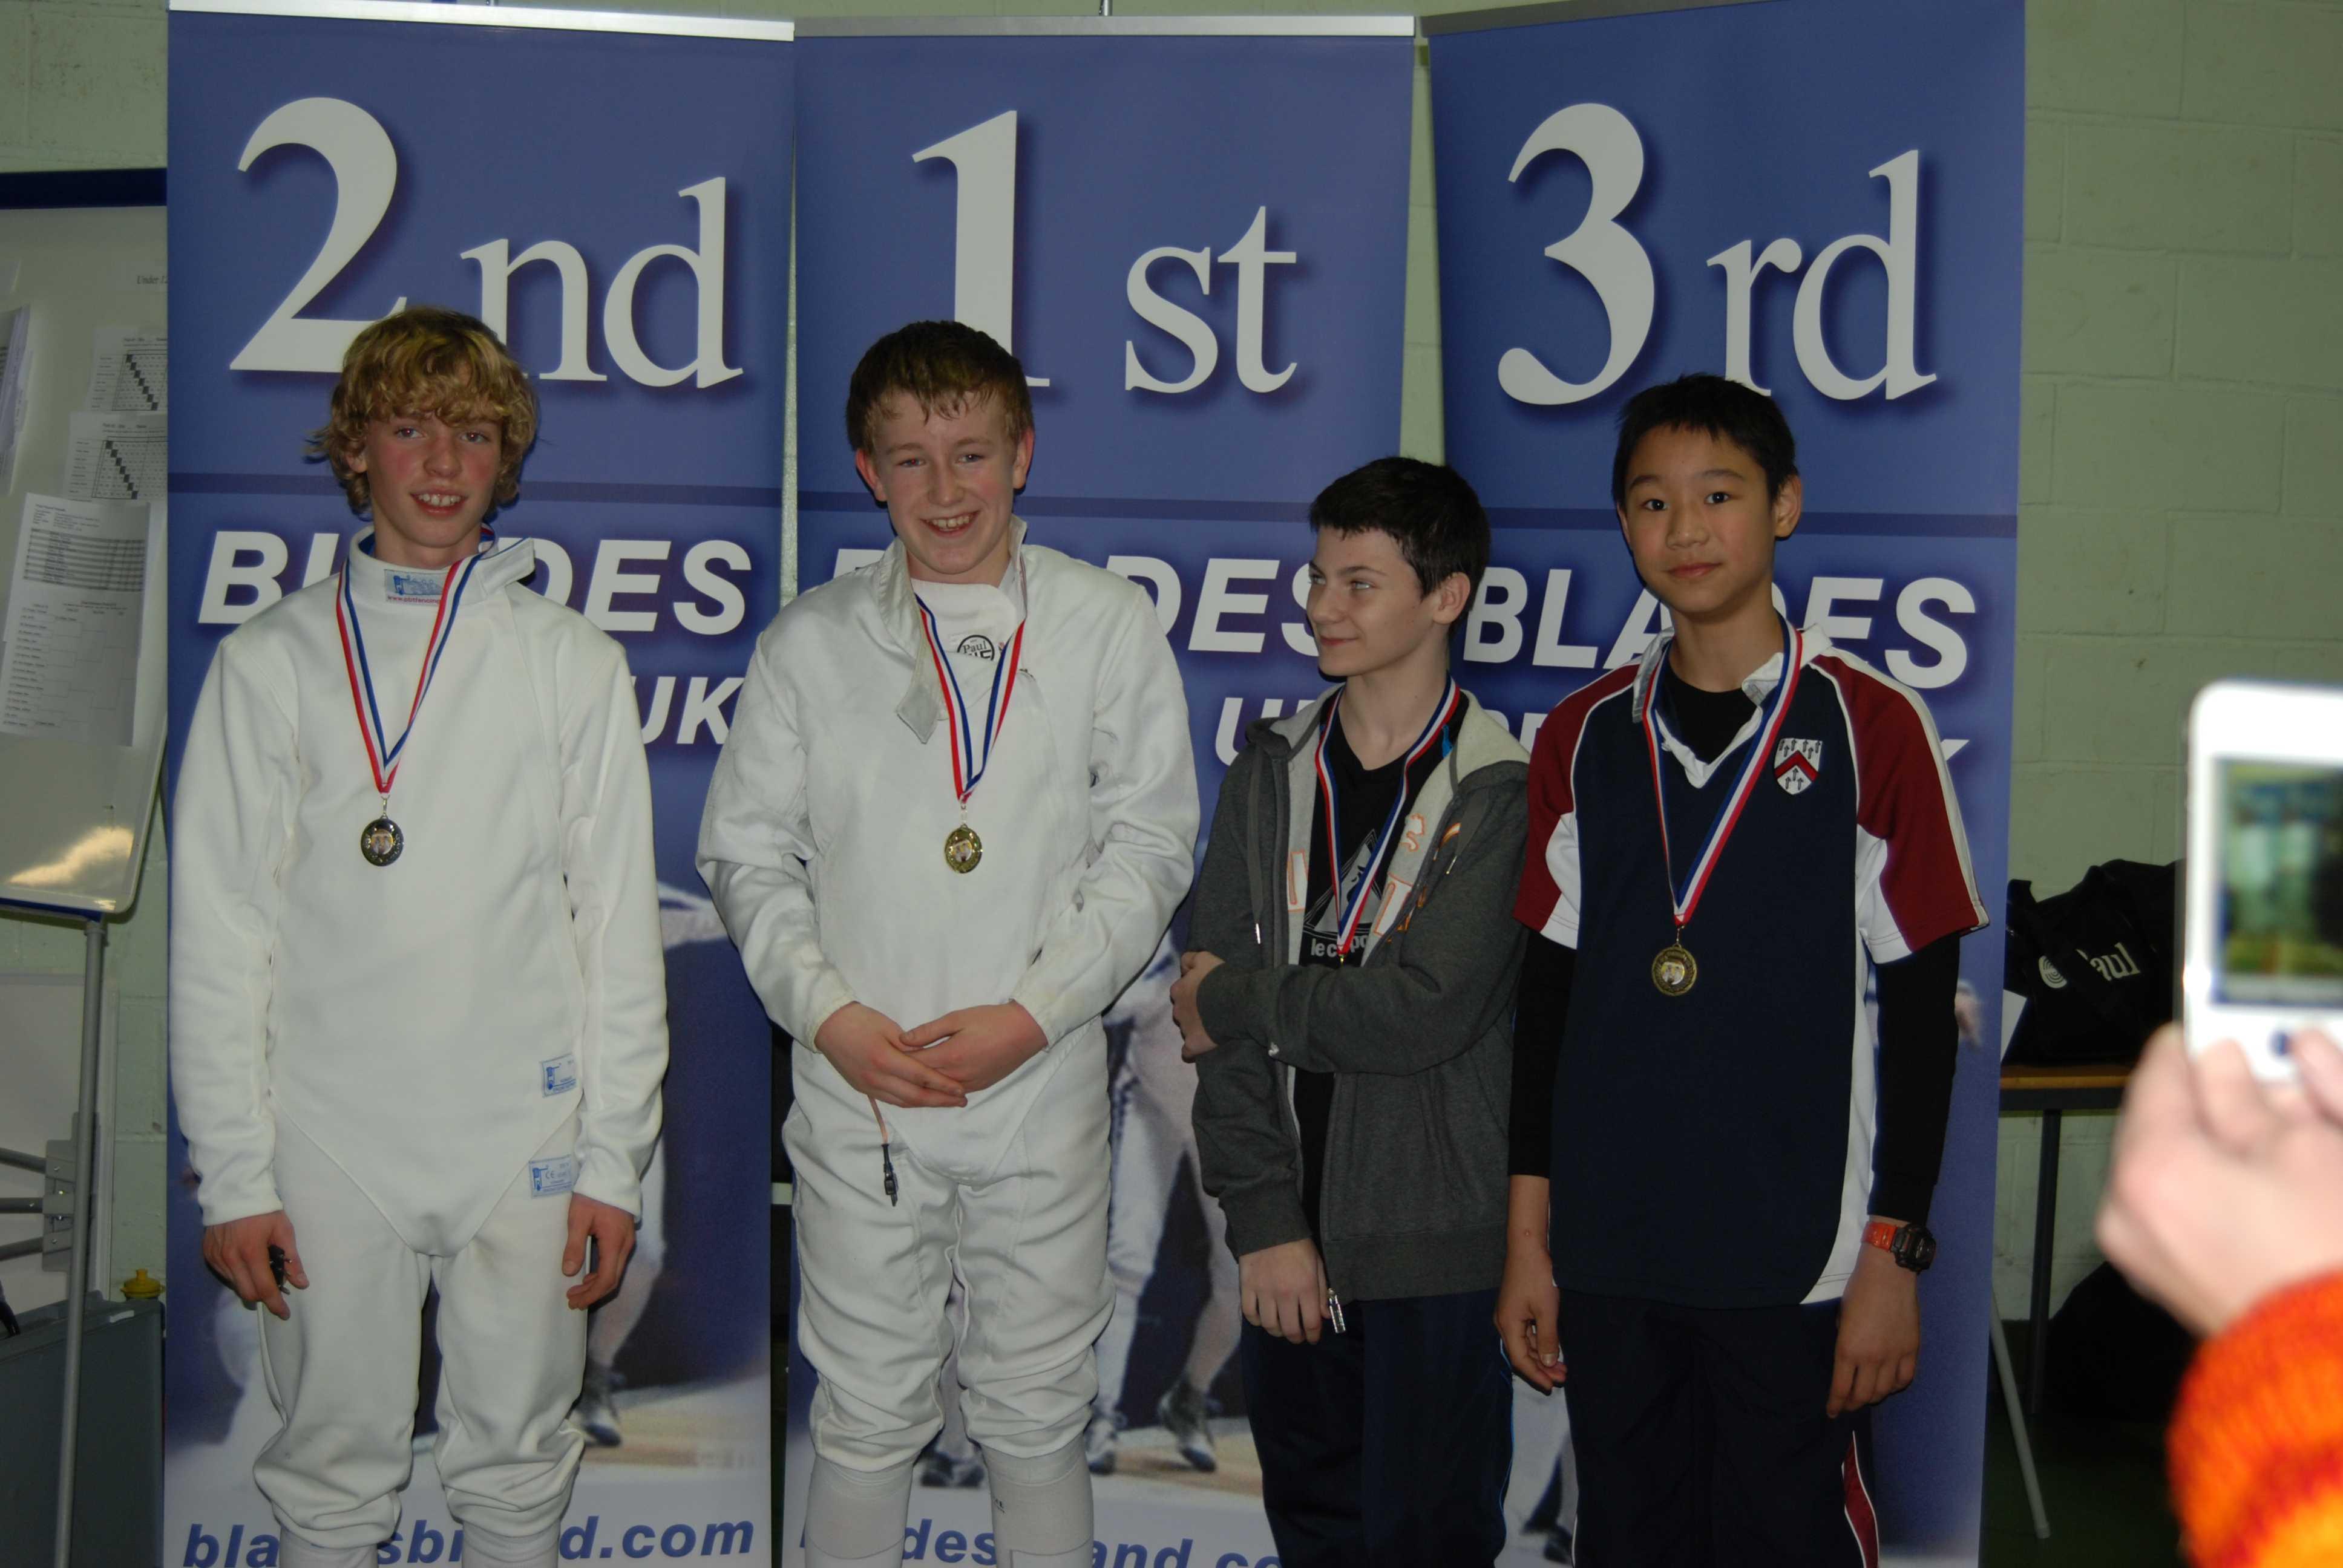 boys-under-14-medal-winners